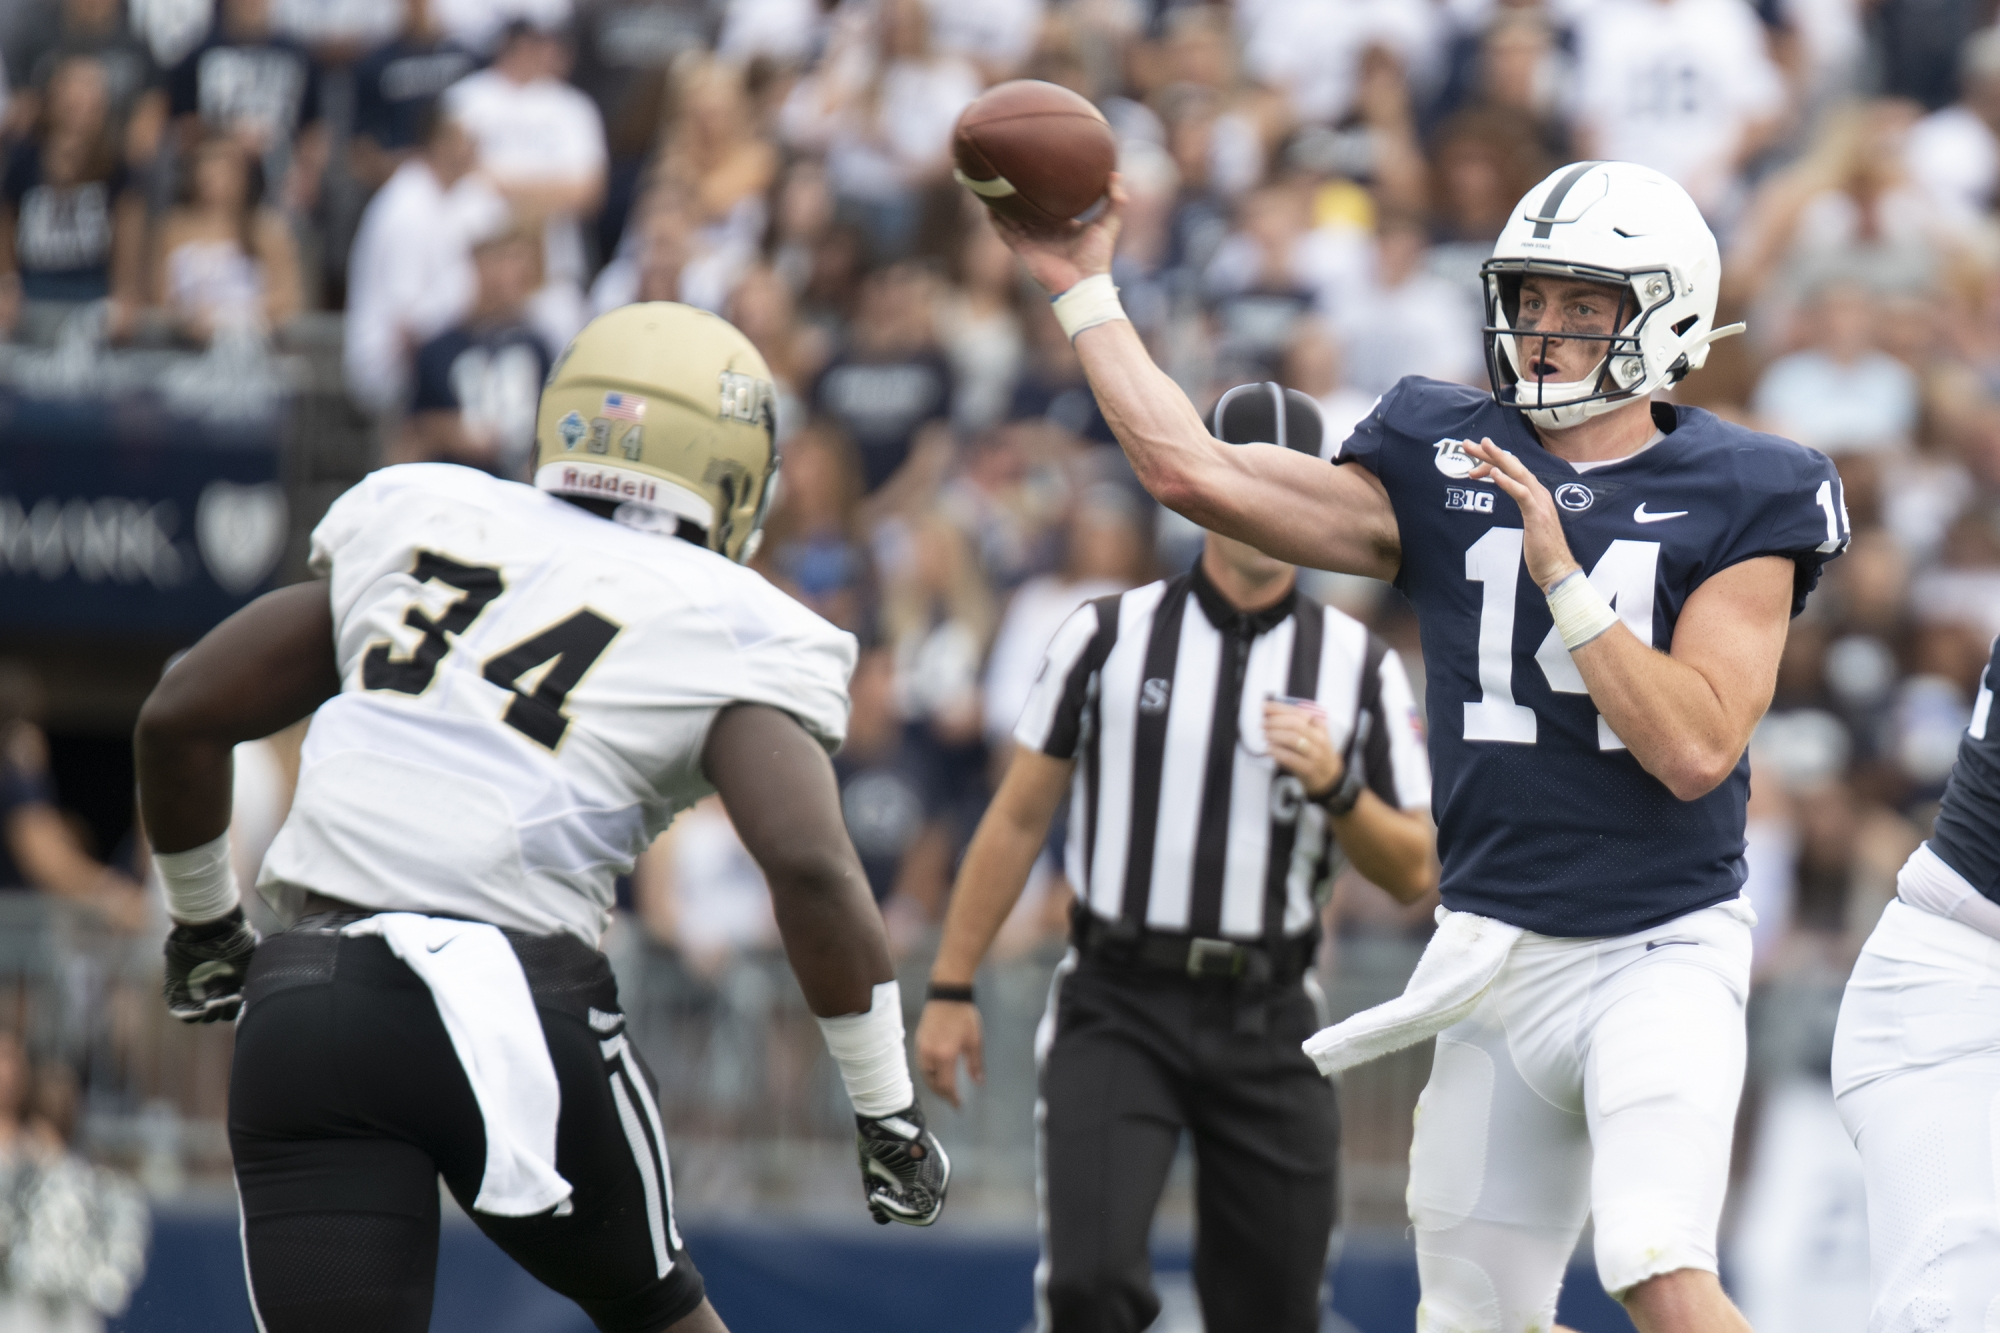 Clifford stars, No. 15 Penn State's defense hammers Idaho ...